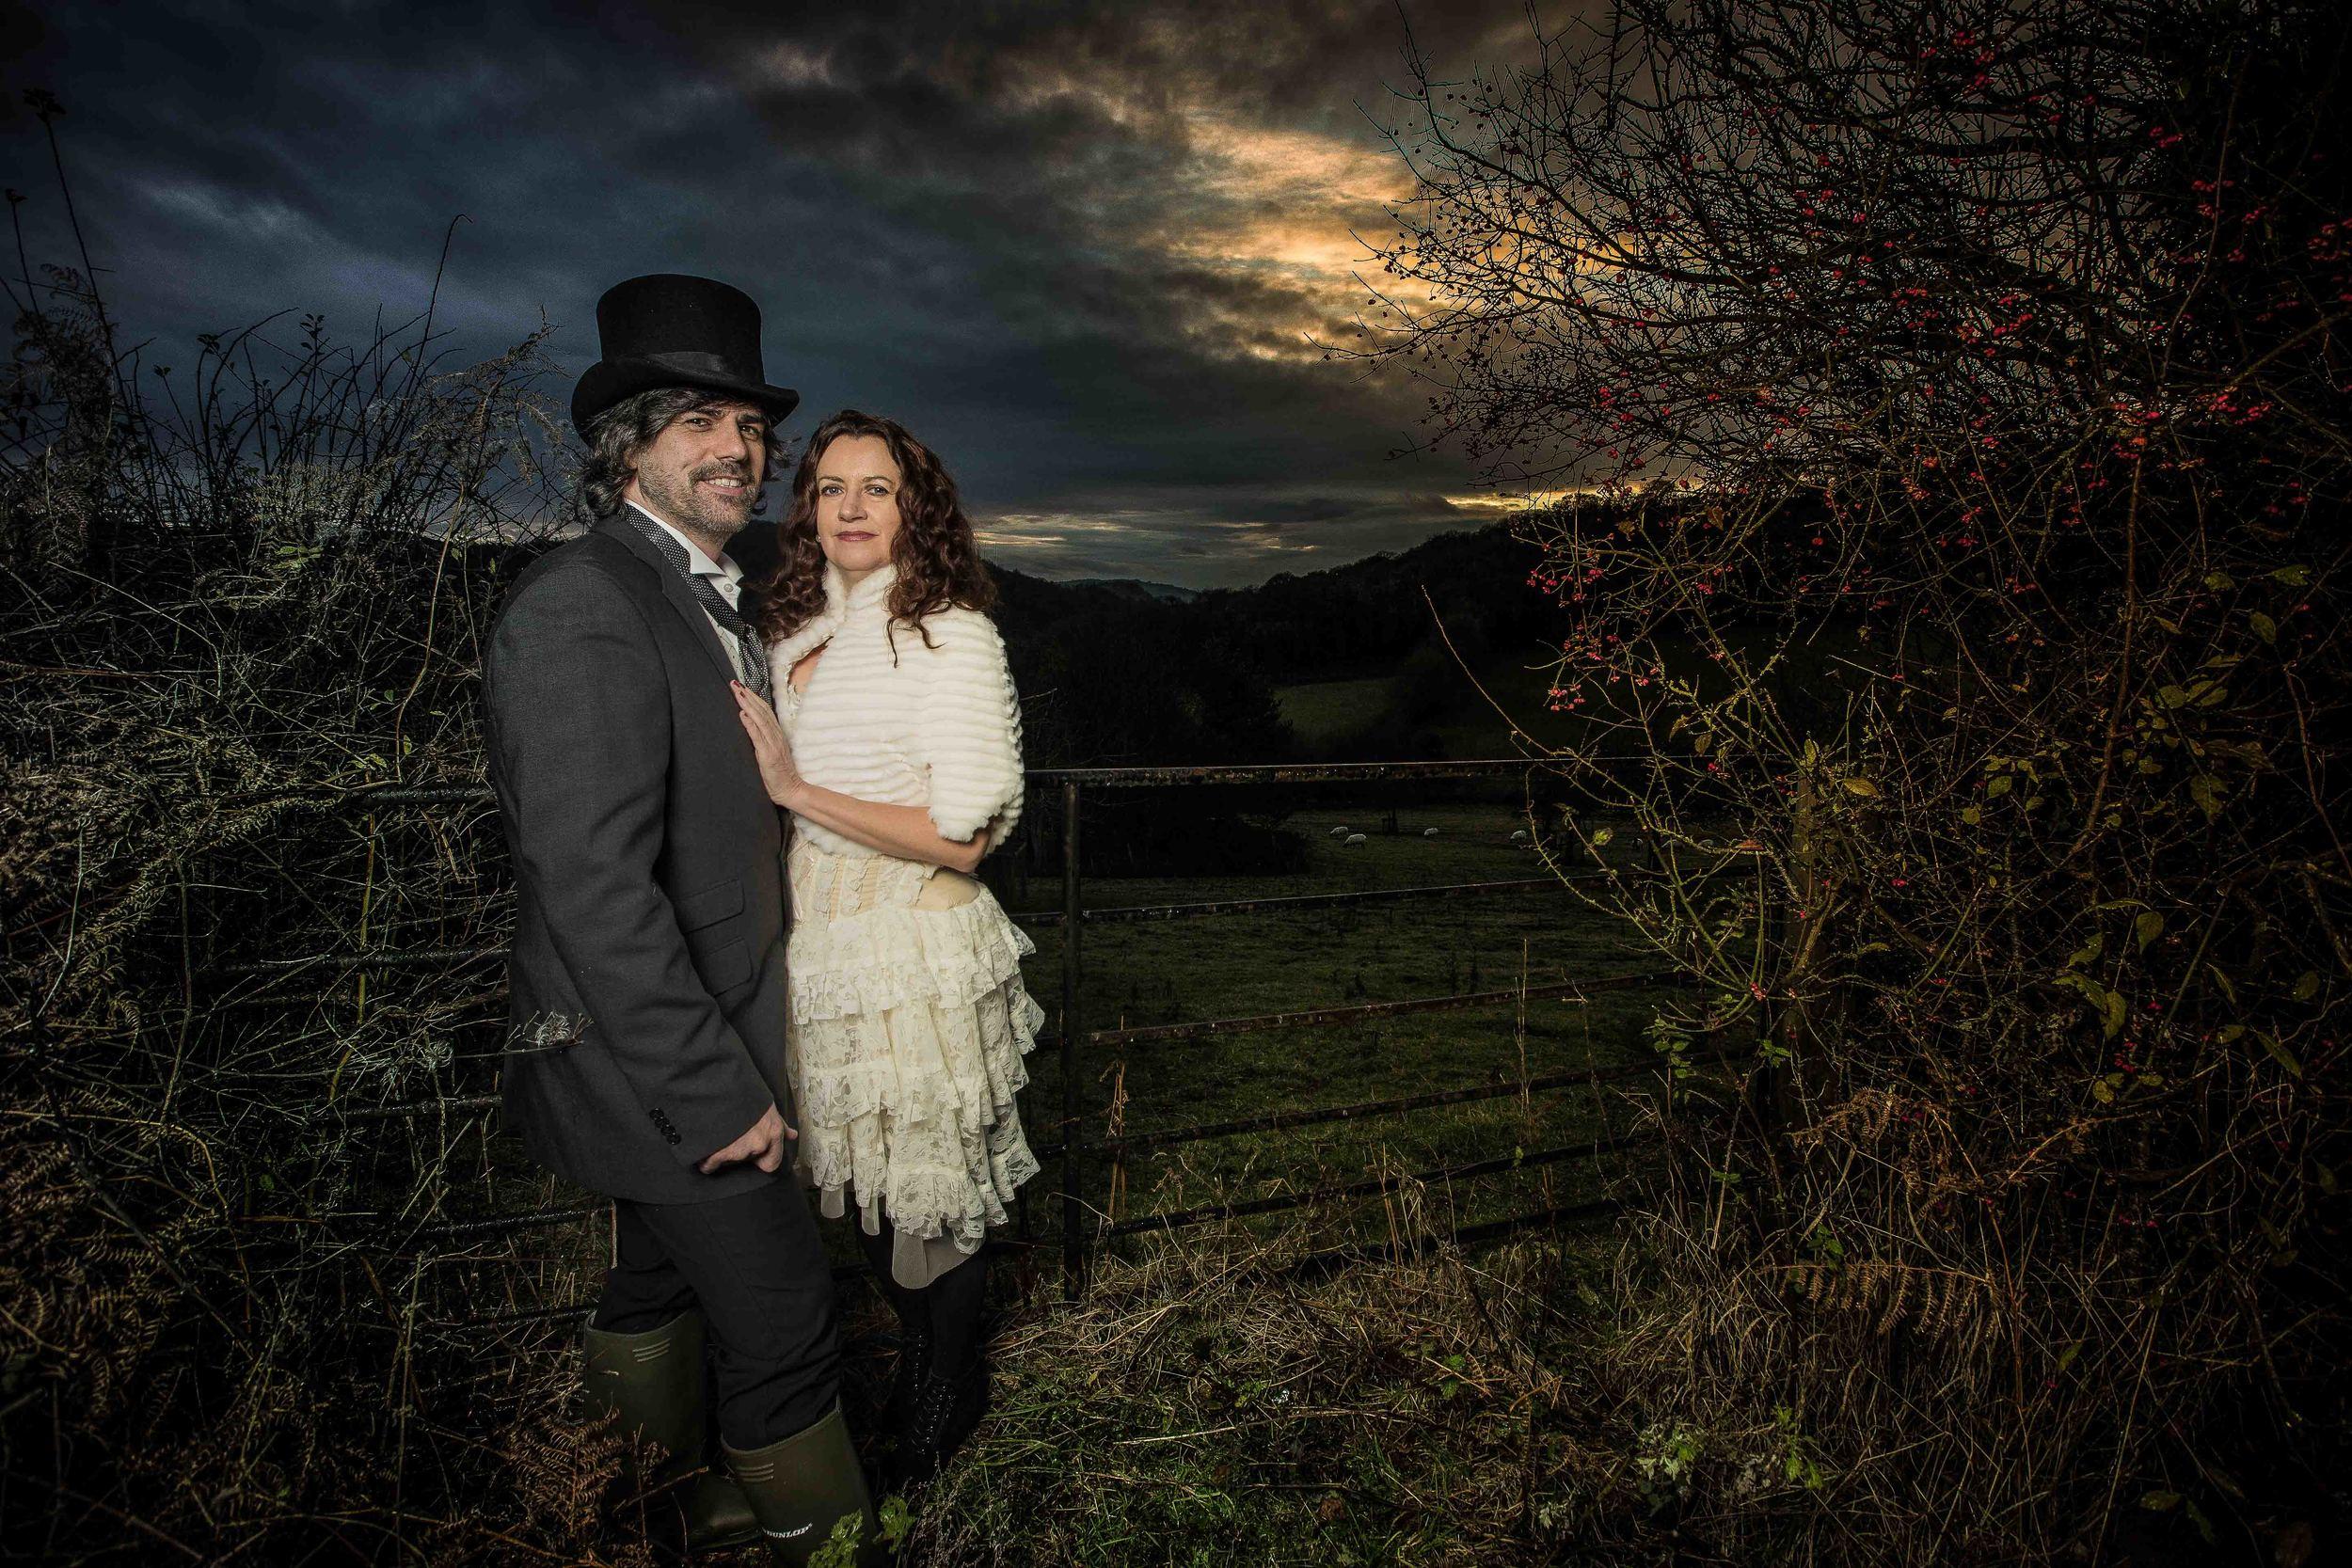 herefordshire-alternative-wedding-london-uk-destination-wedding-4-photography-Adam-Rowley